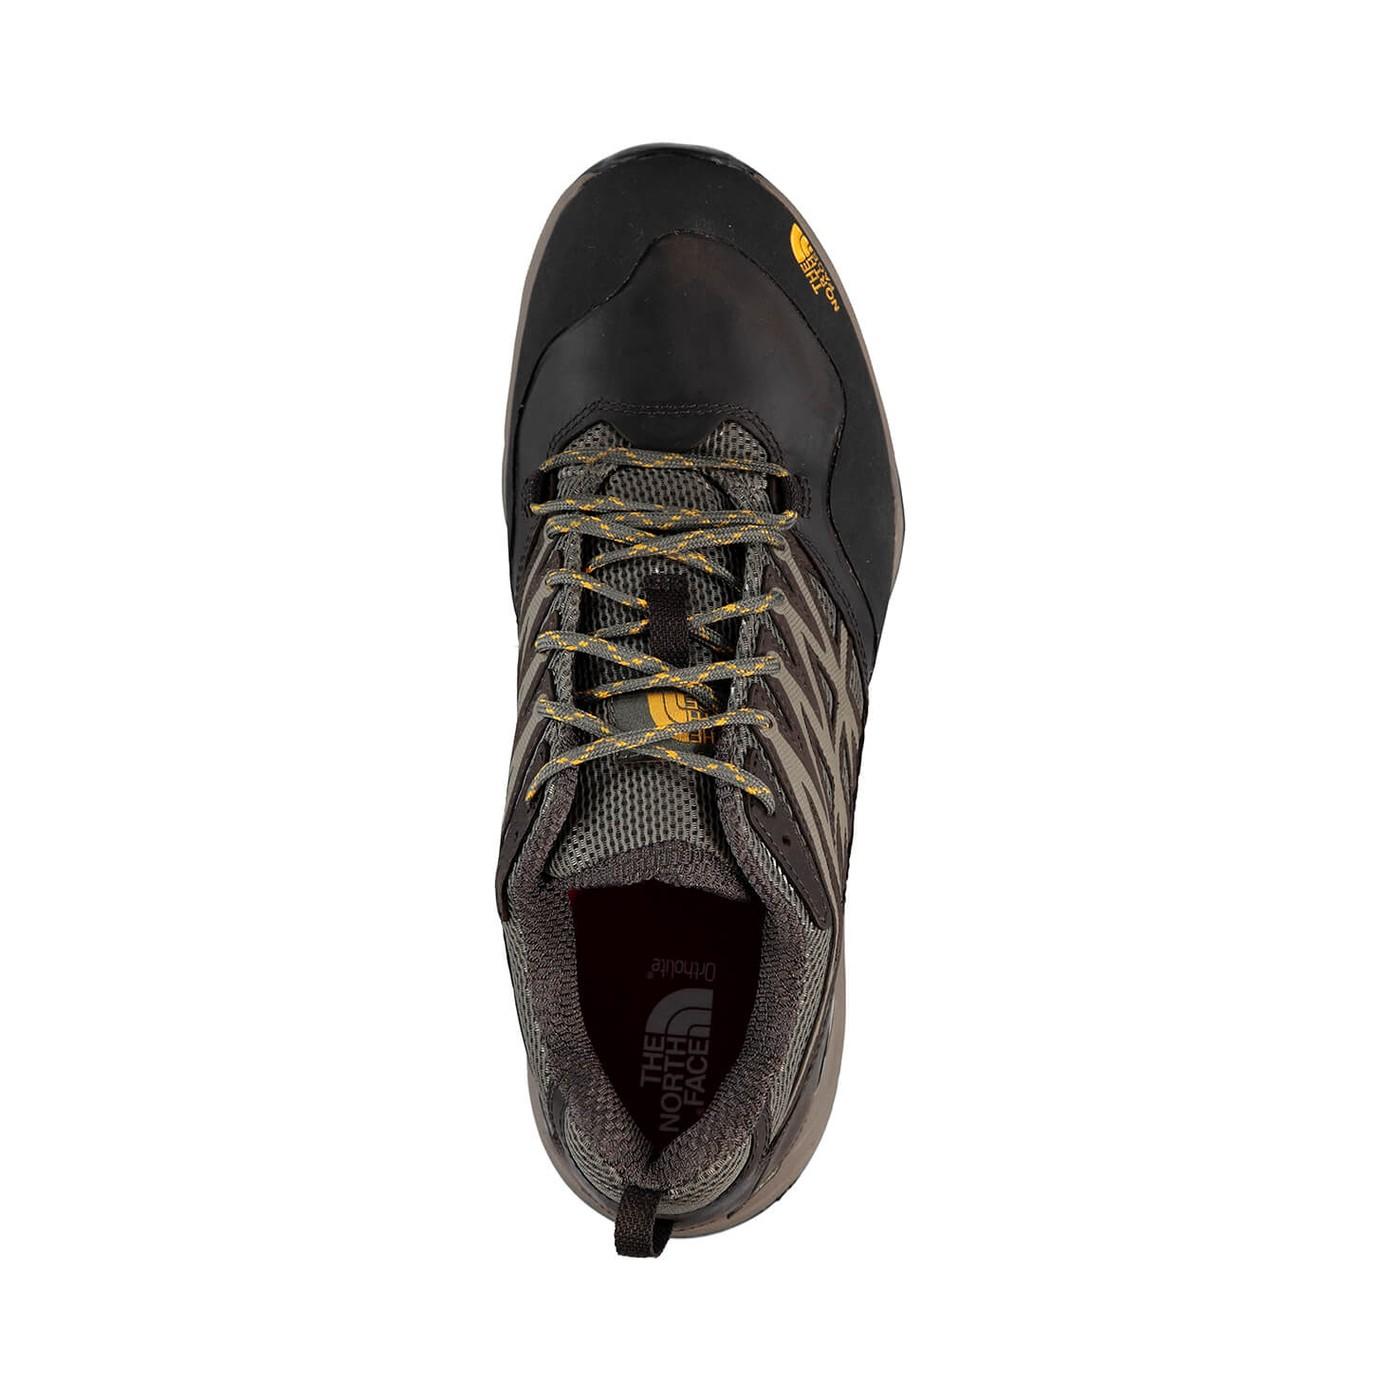 e4739a825 The North Face Hedgehog Hike Gore-Tex Erkek Kahverengi Spor Ayakkabı